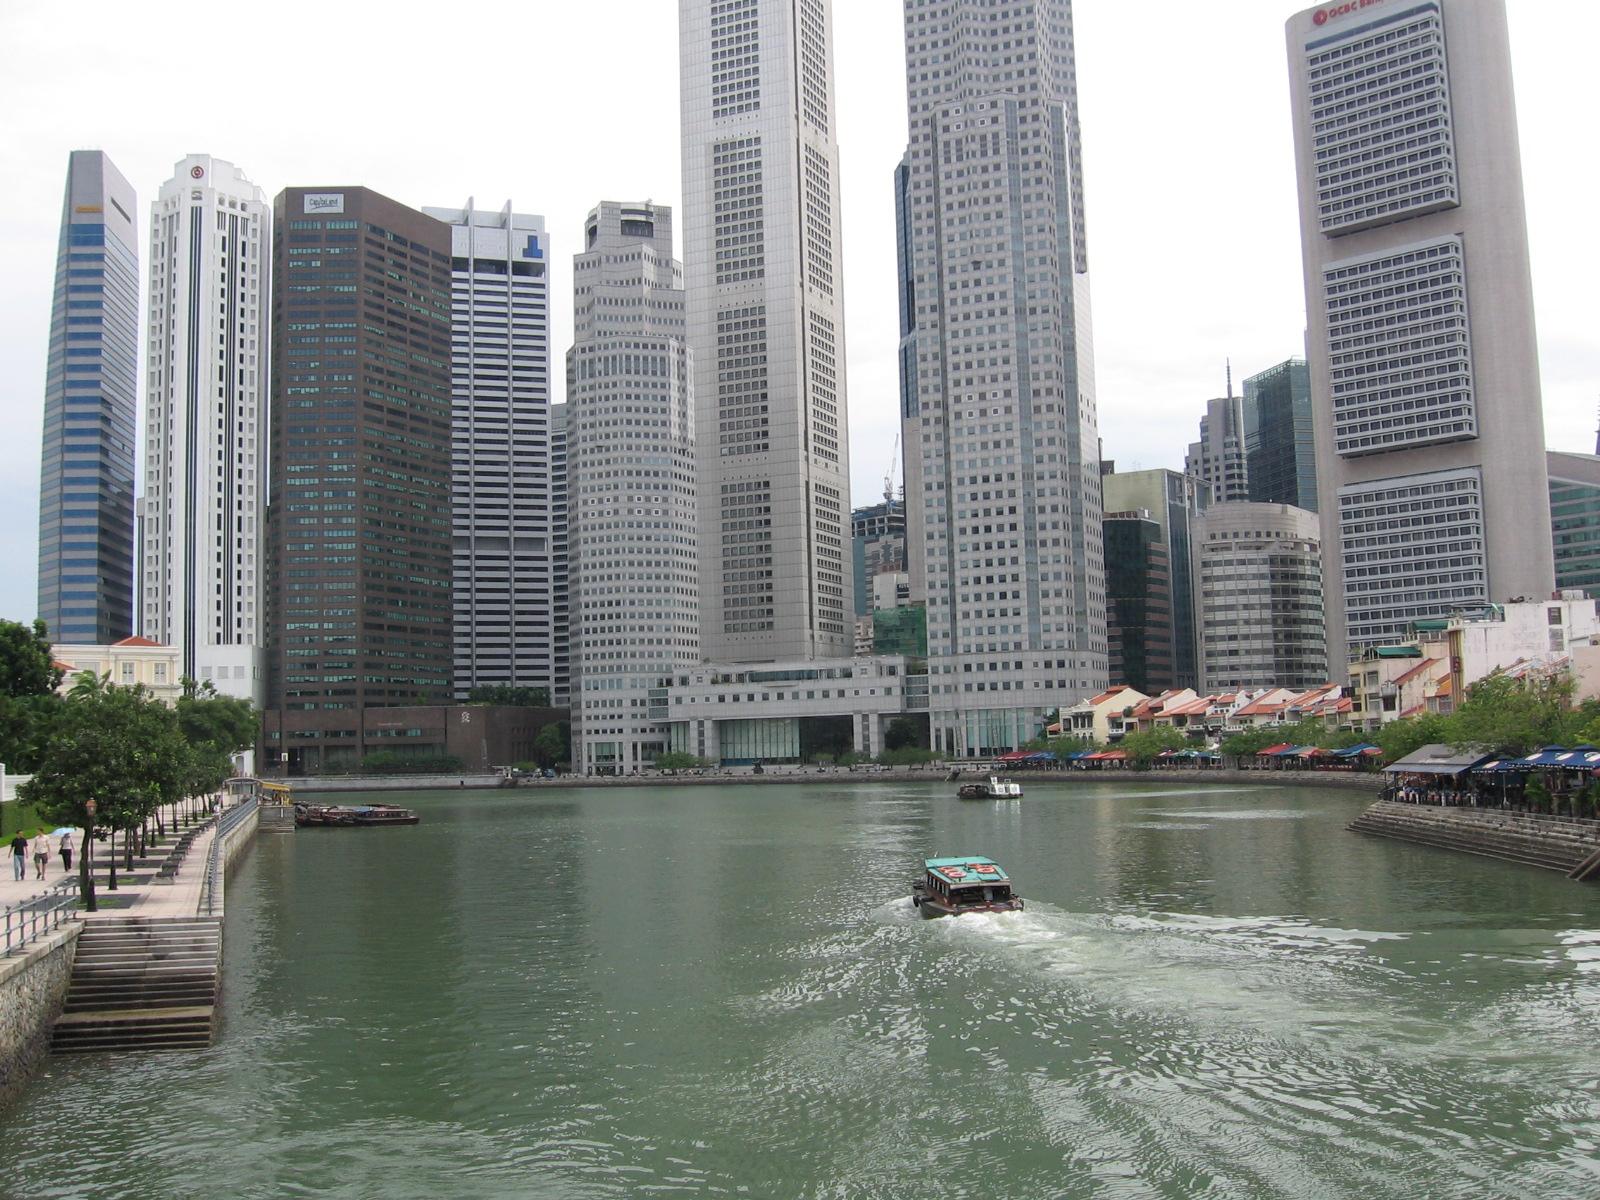 Redistribution >> File:Singapore River 2, Dec 05.JPG - Wikimedia Commons